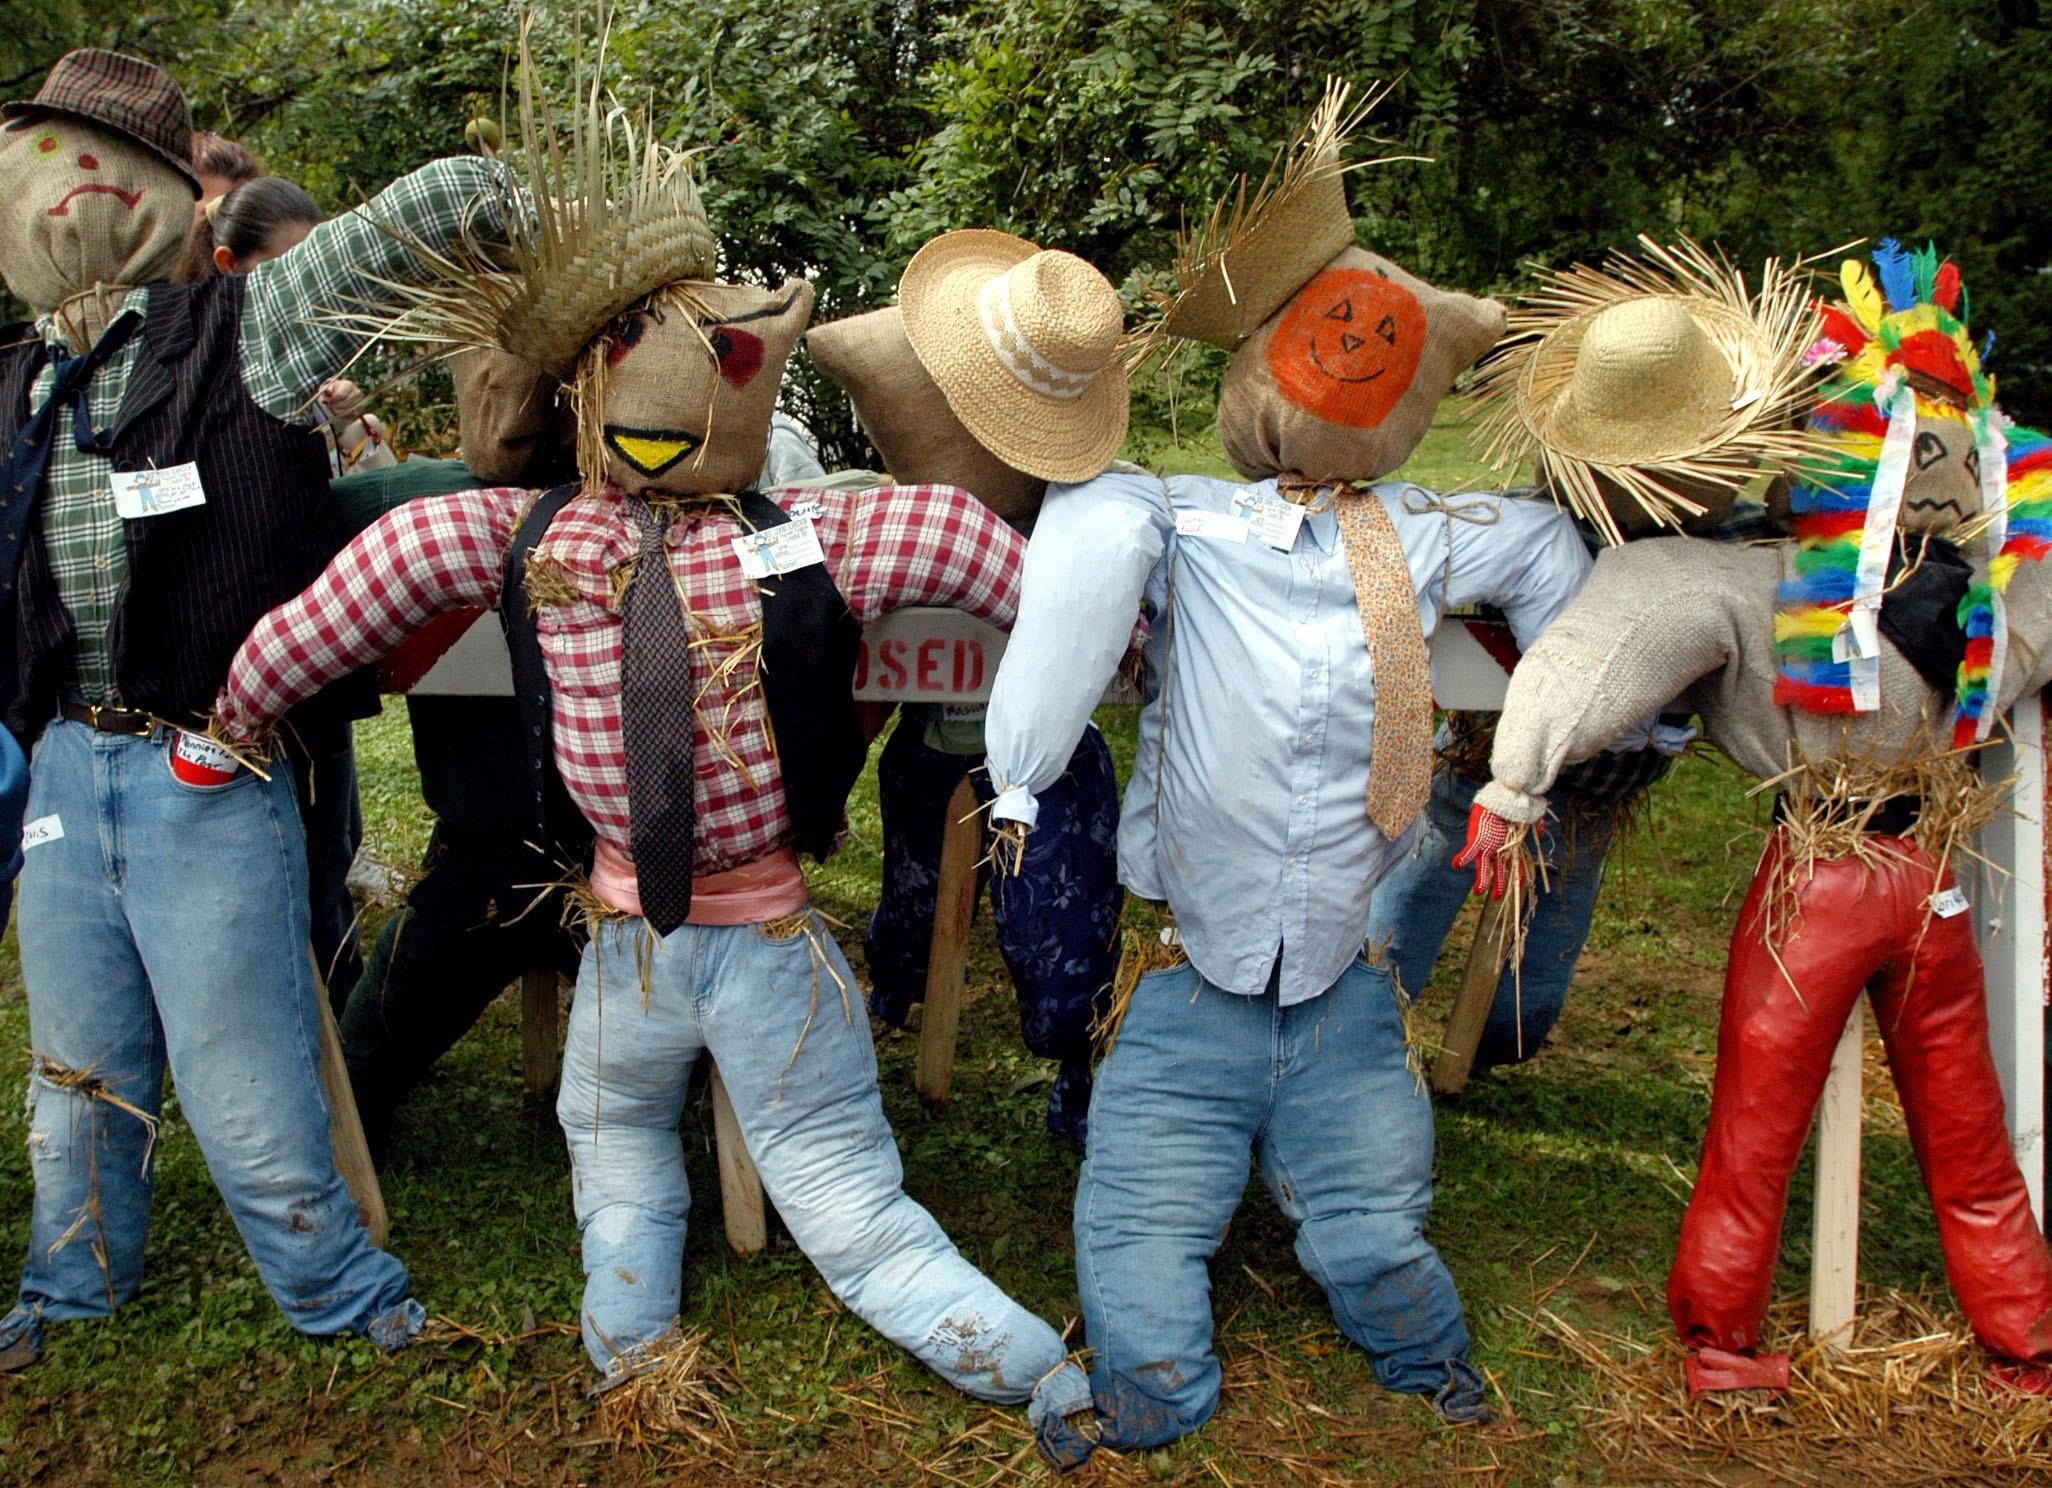 db20316bd64cc24c178a_harvest_festival_scarecrows_092610.jpg